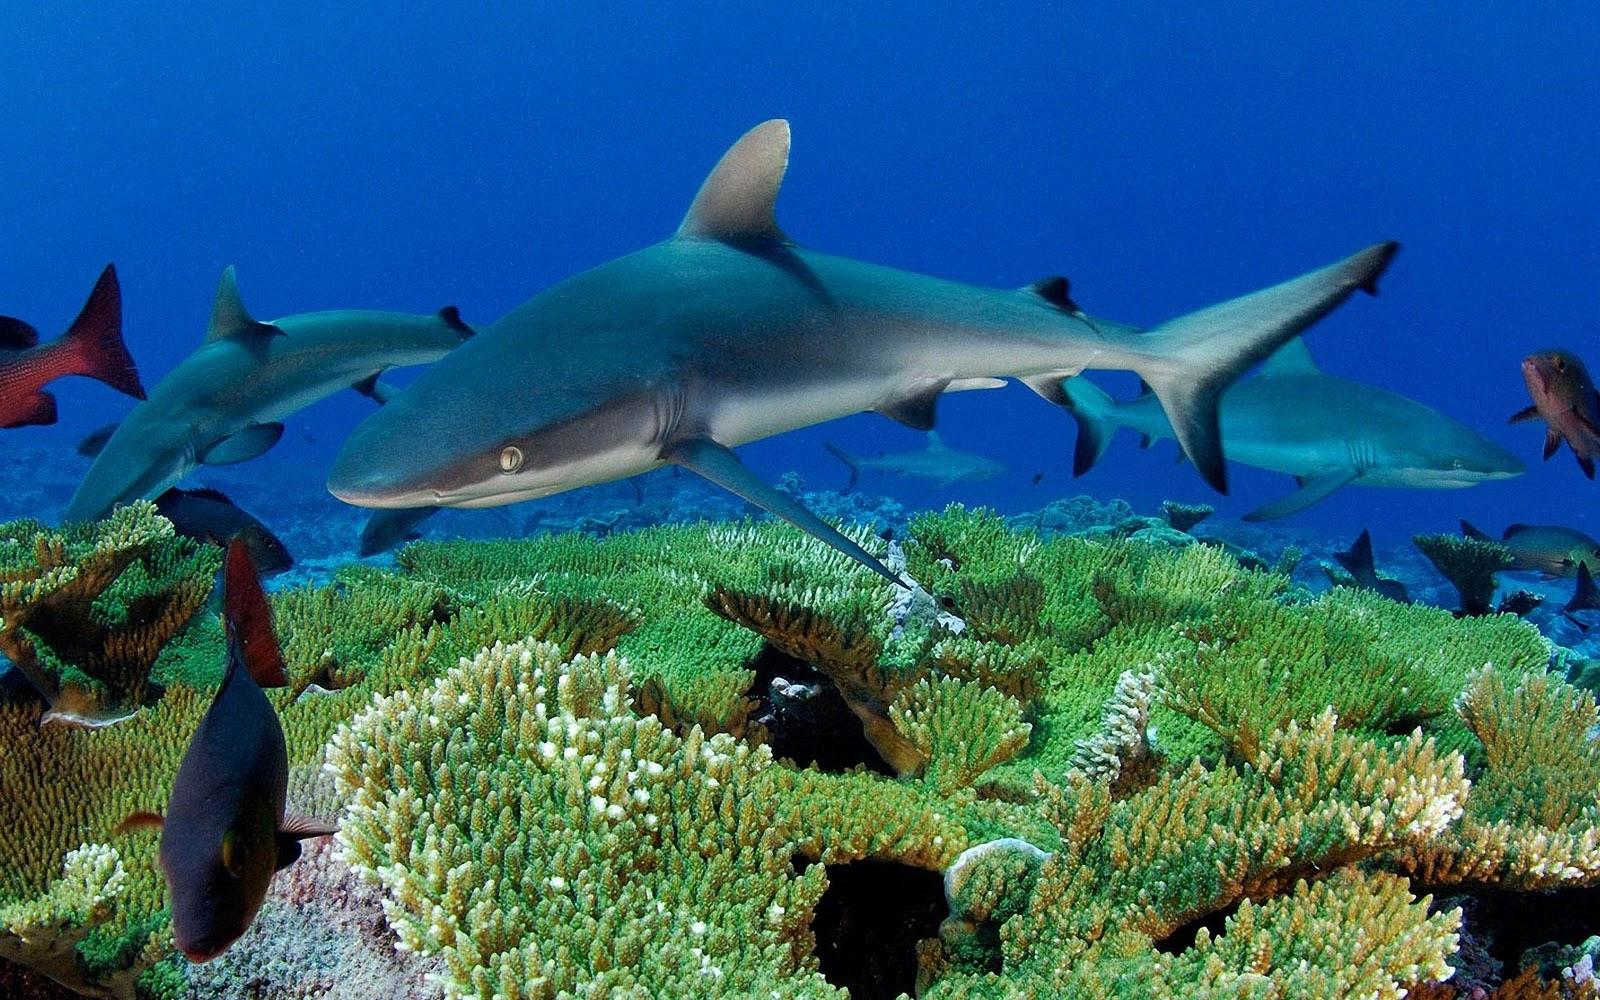 download wallpaper shark 1600 - photo #41